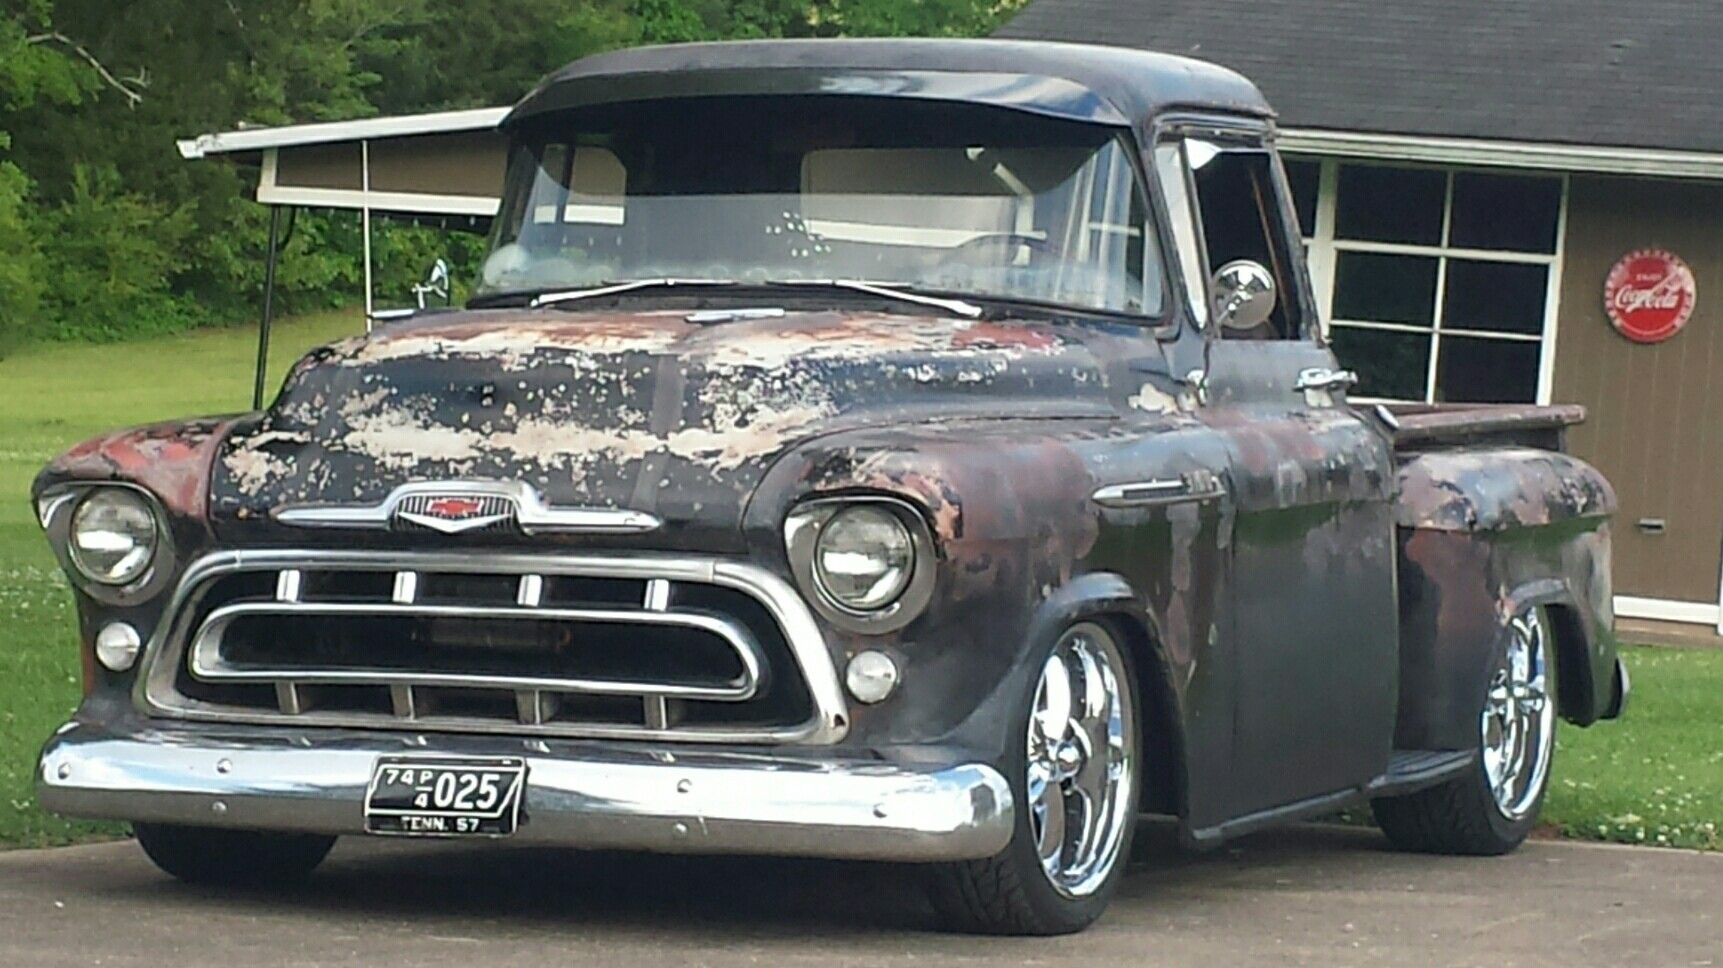 medium resolution of 57 chevy truck rat rod garage low rider weathered 3100 series hot rod street rod classic custom